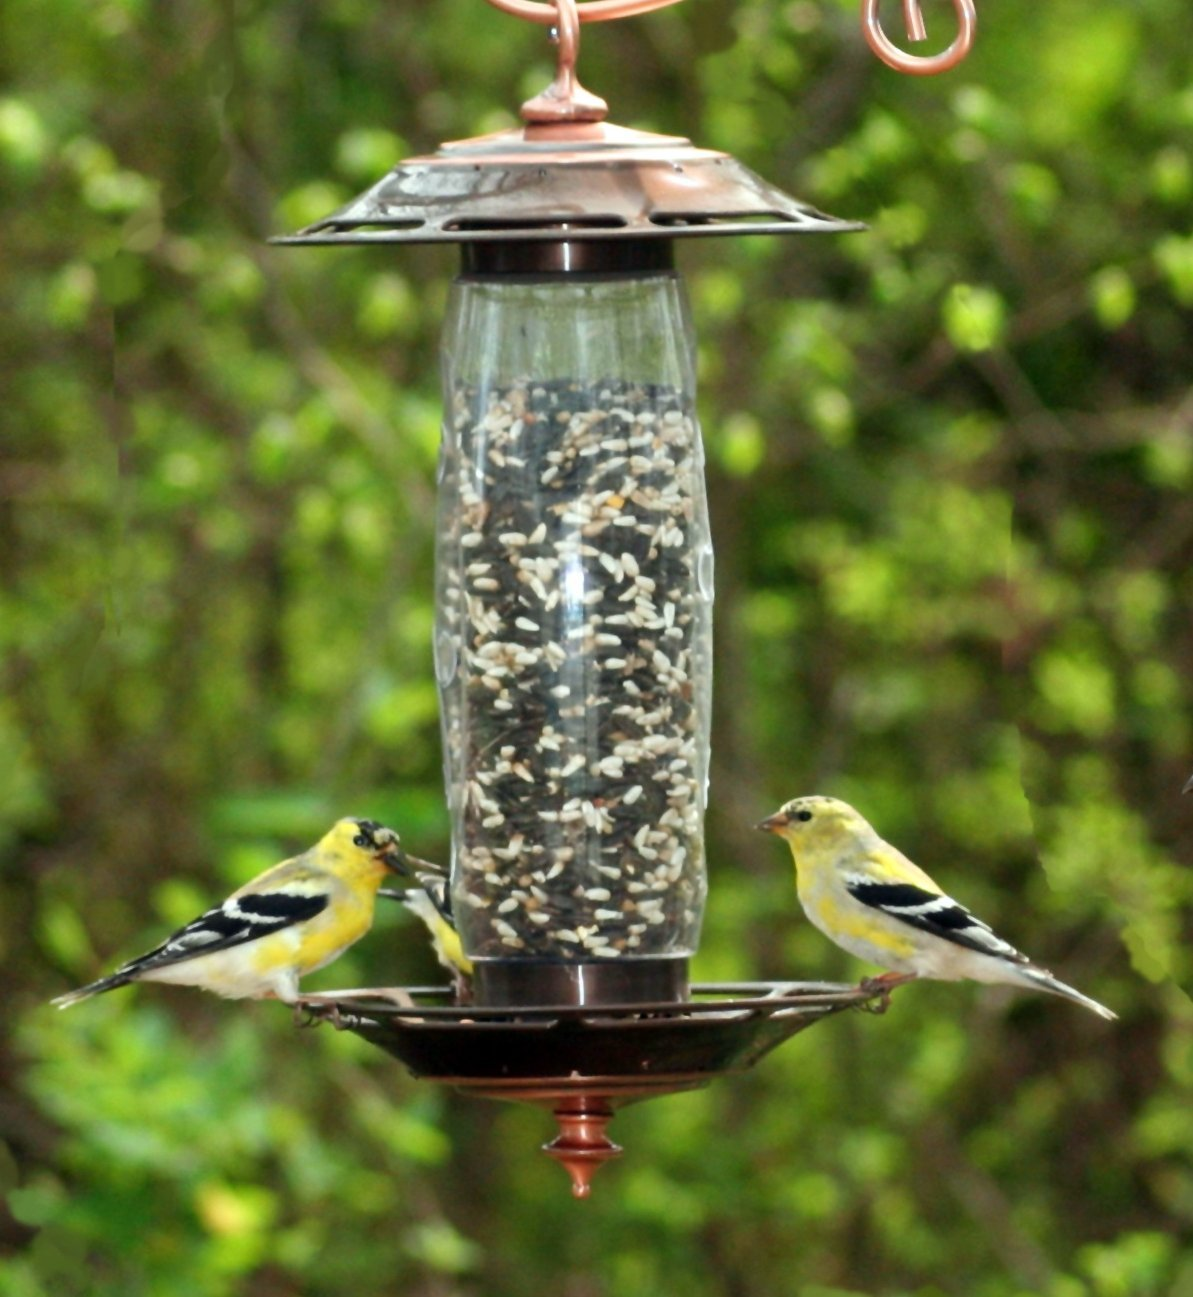 Perky-Pet 737S Sip or Seed Wild Bird Feeder